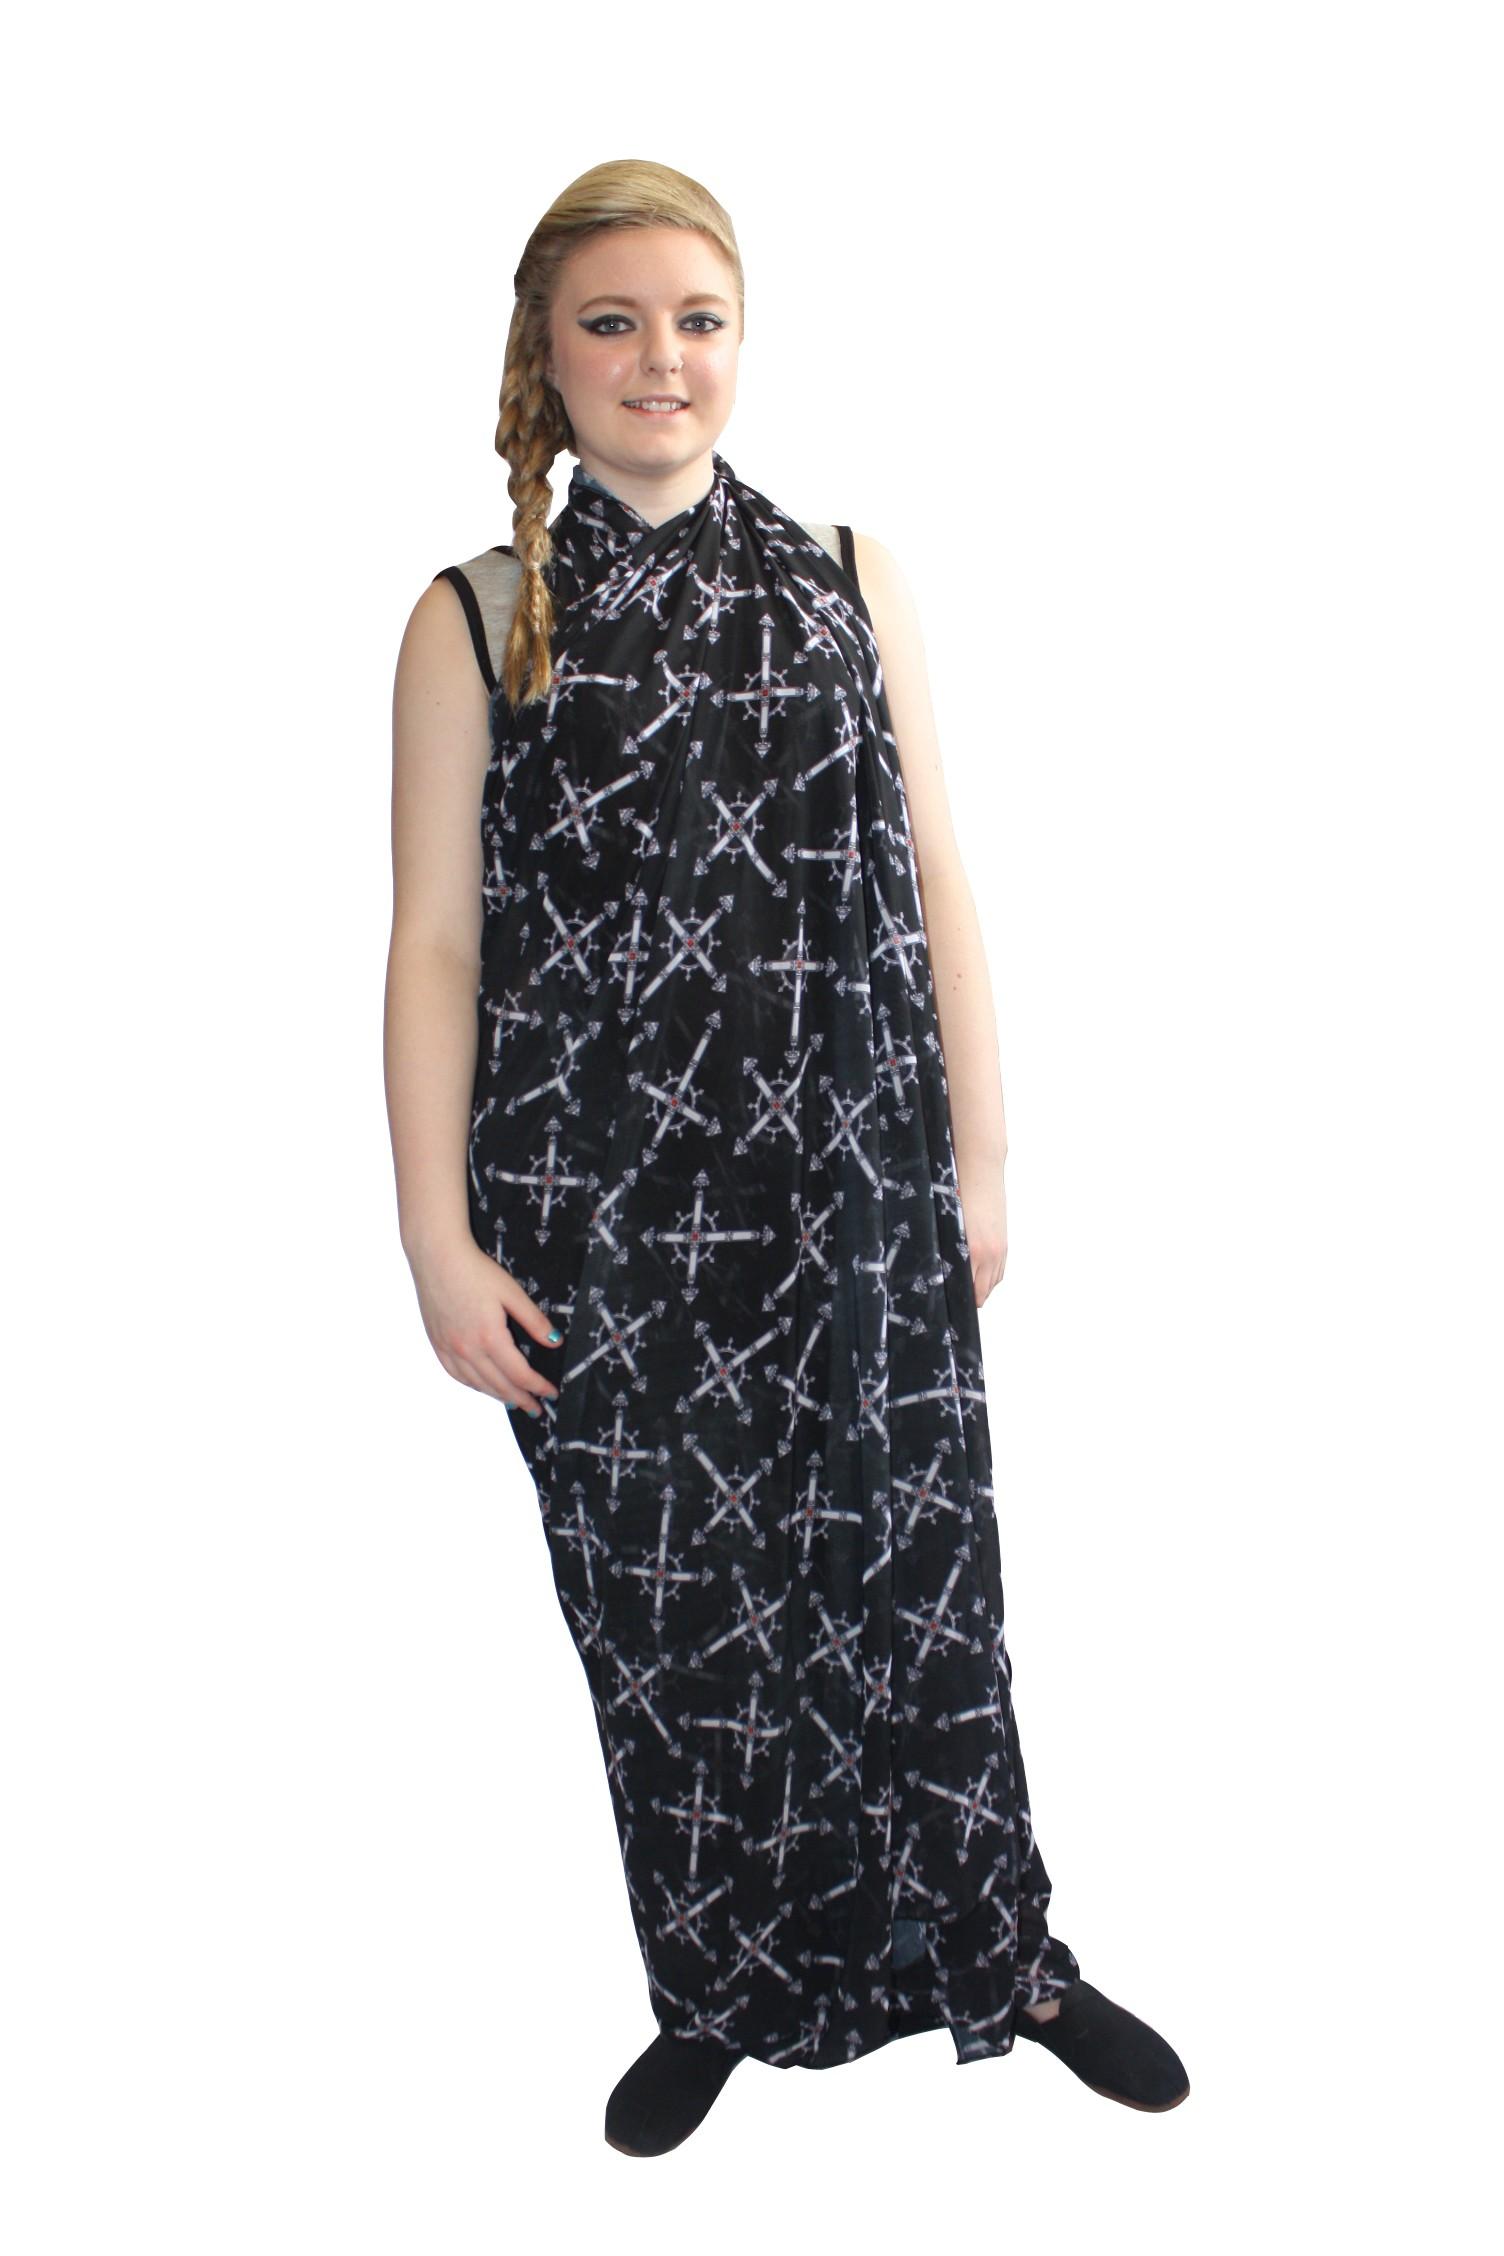 Women's Sheer Viccan Cross Print Silky Long Scarf